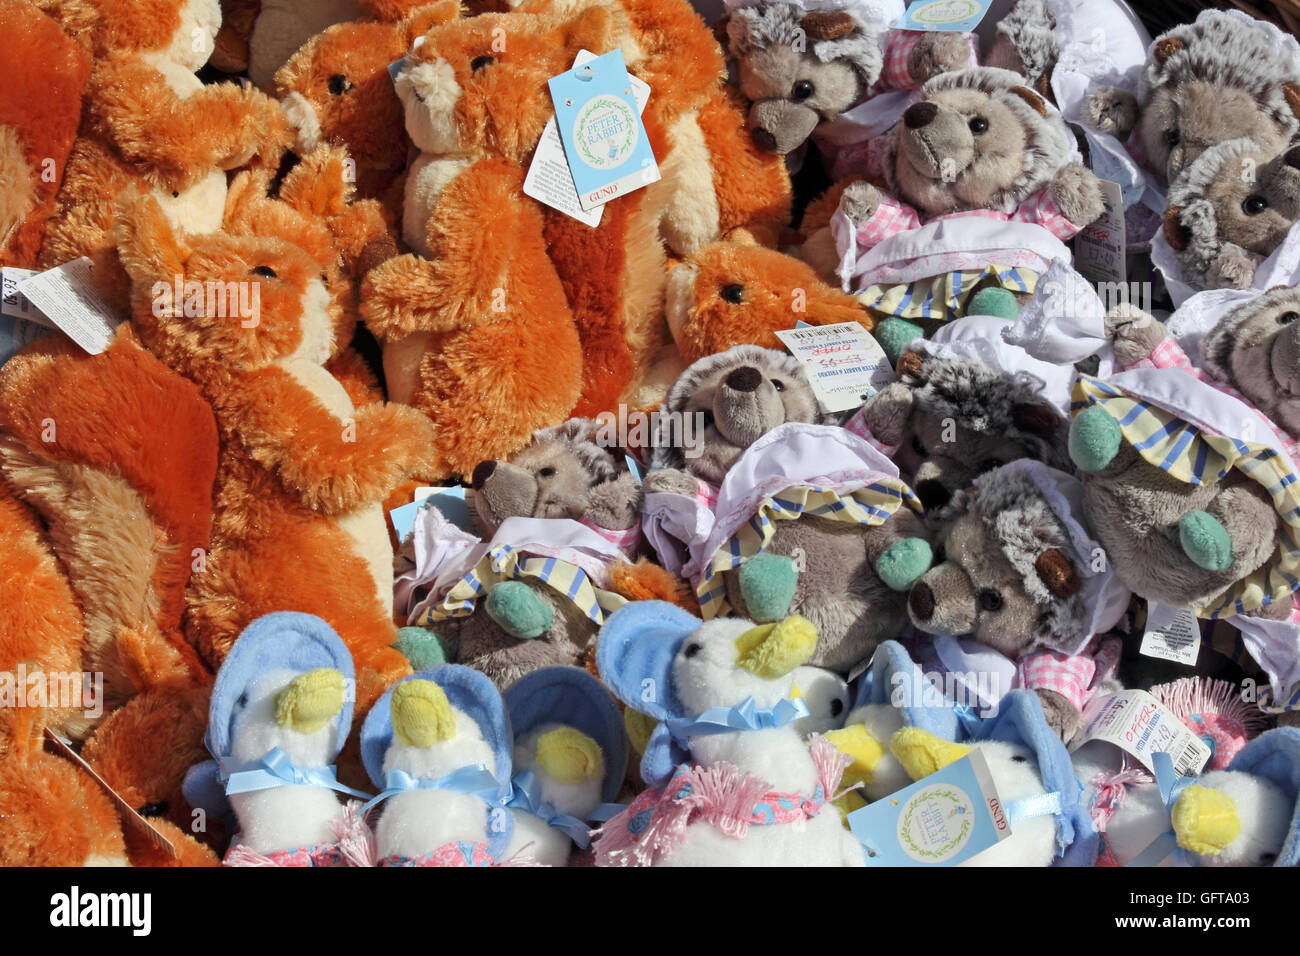 Basket of Beatrix Potter character dolls outside shop - Stock Image